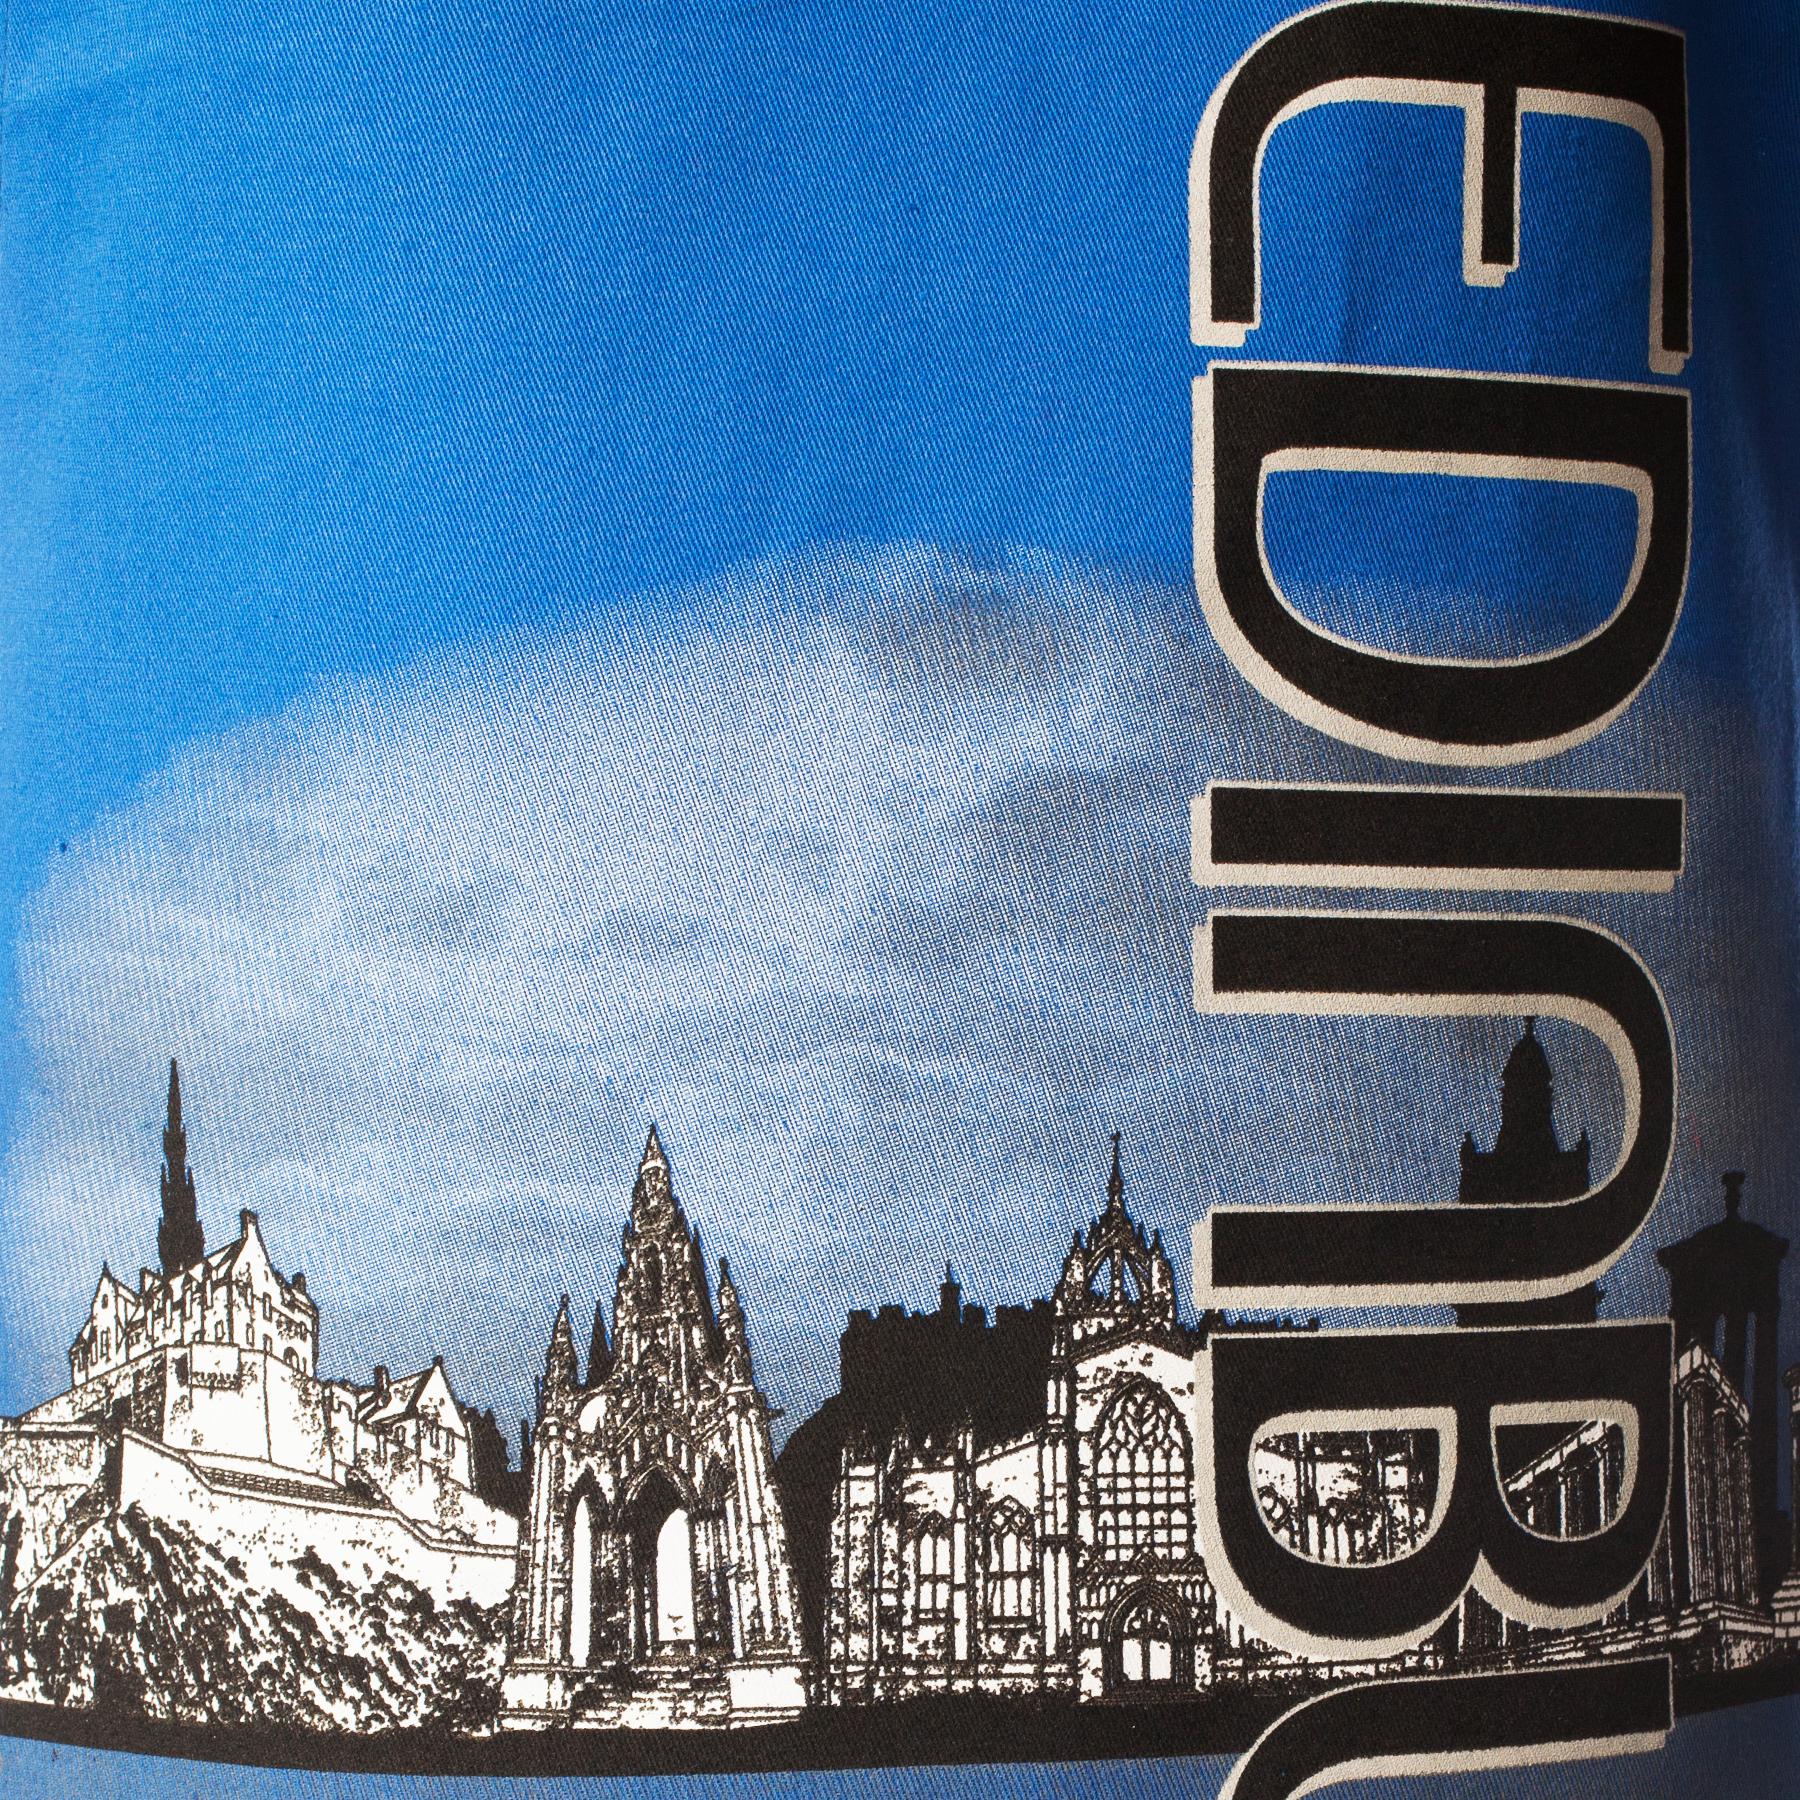 White apron edinburgh - Safon Clothing Apron View Edinburgh